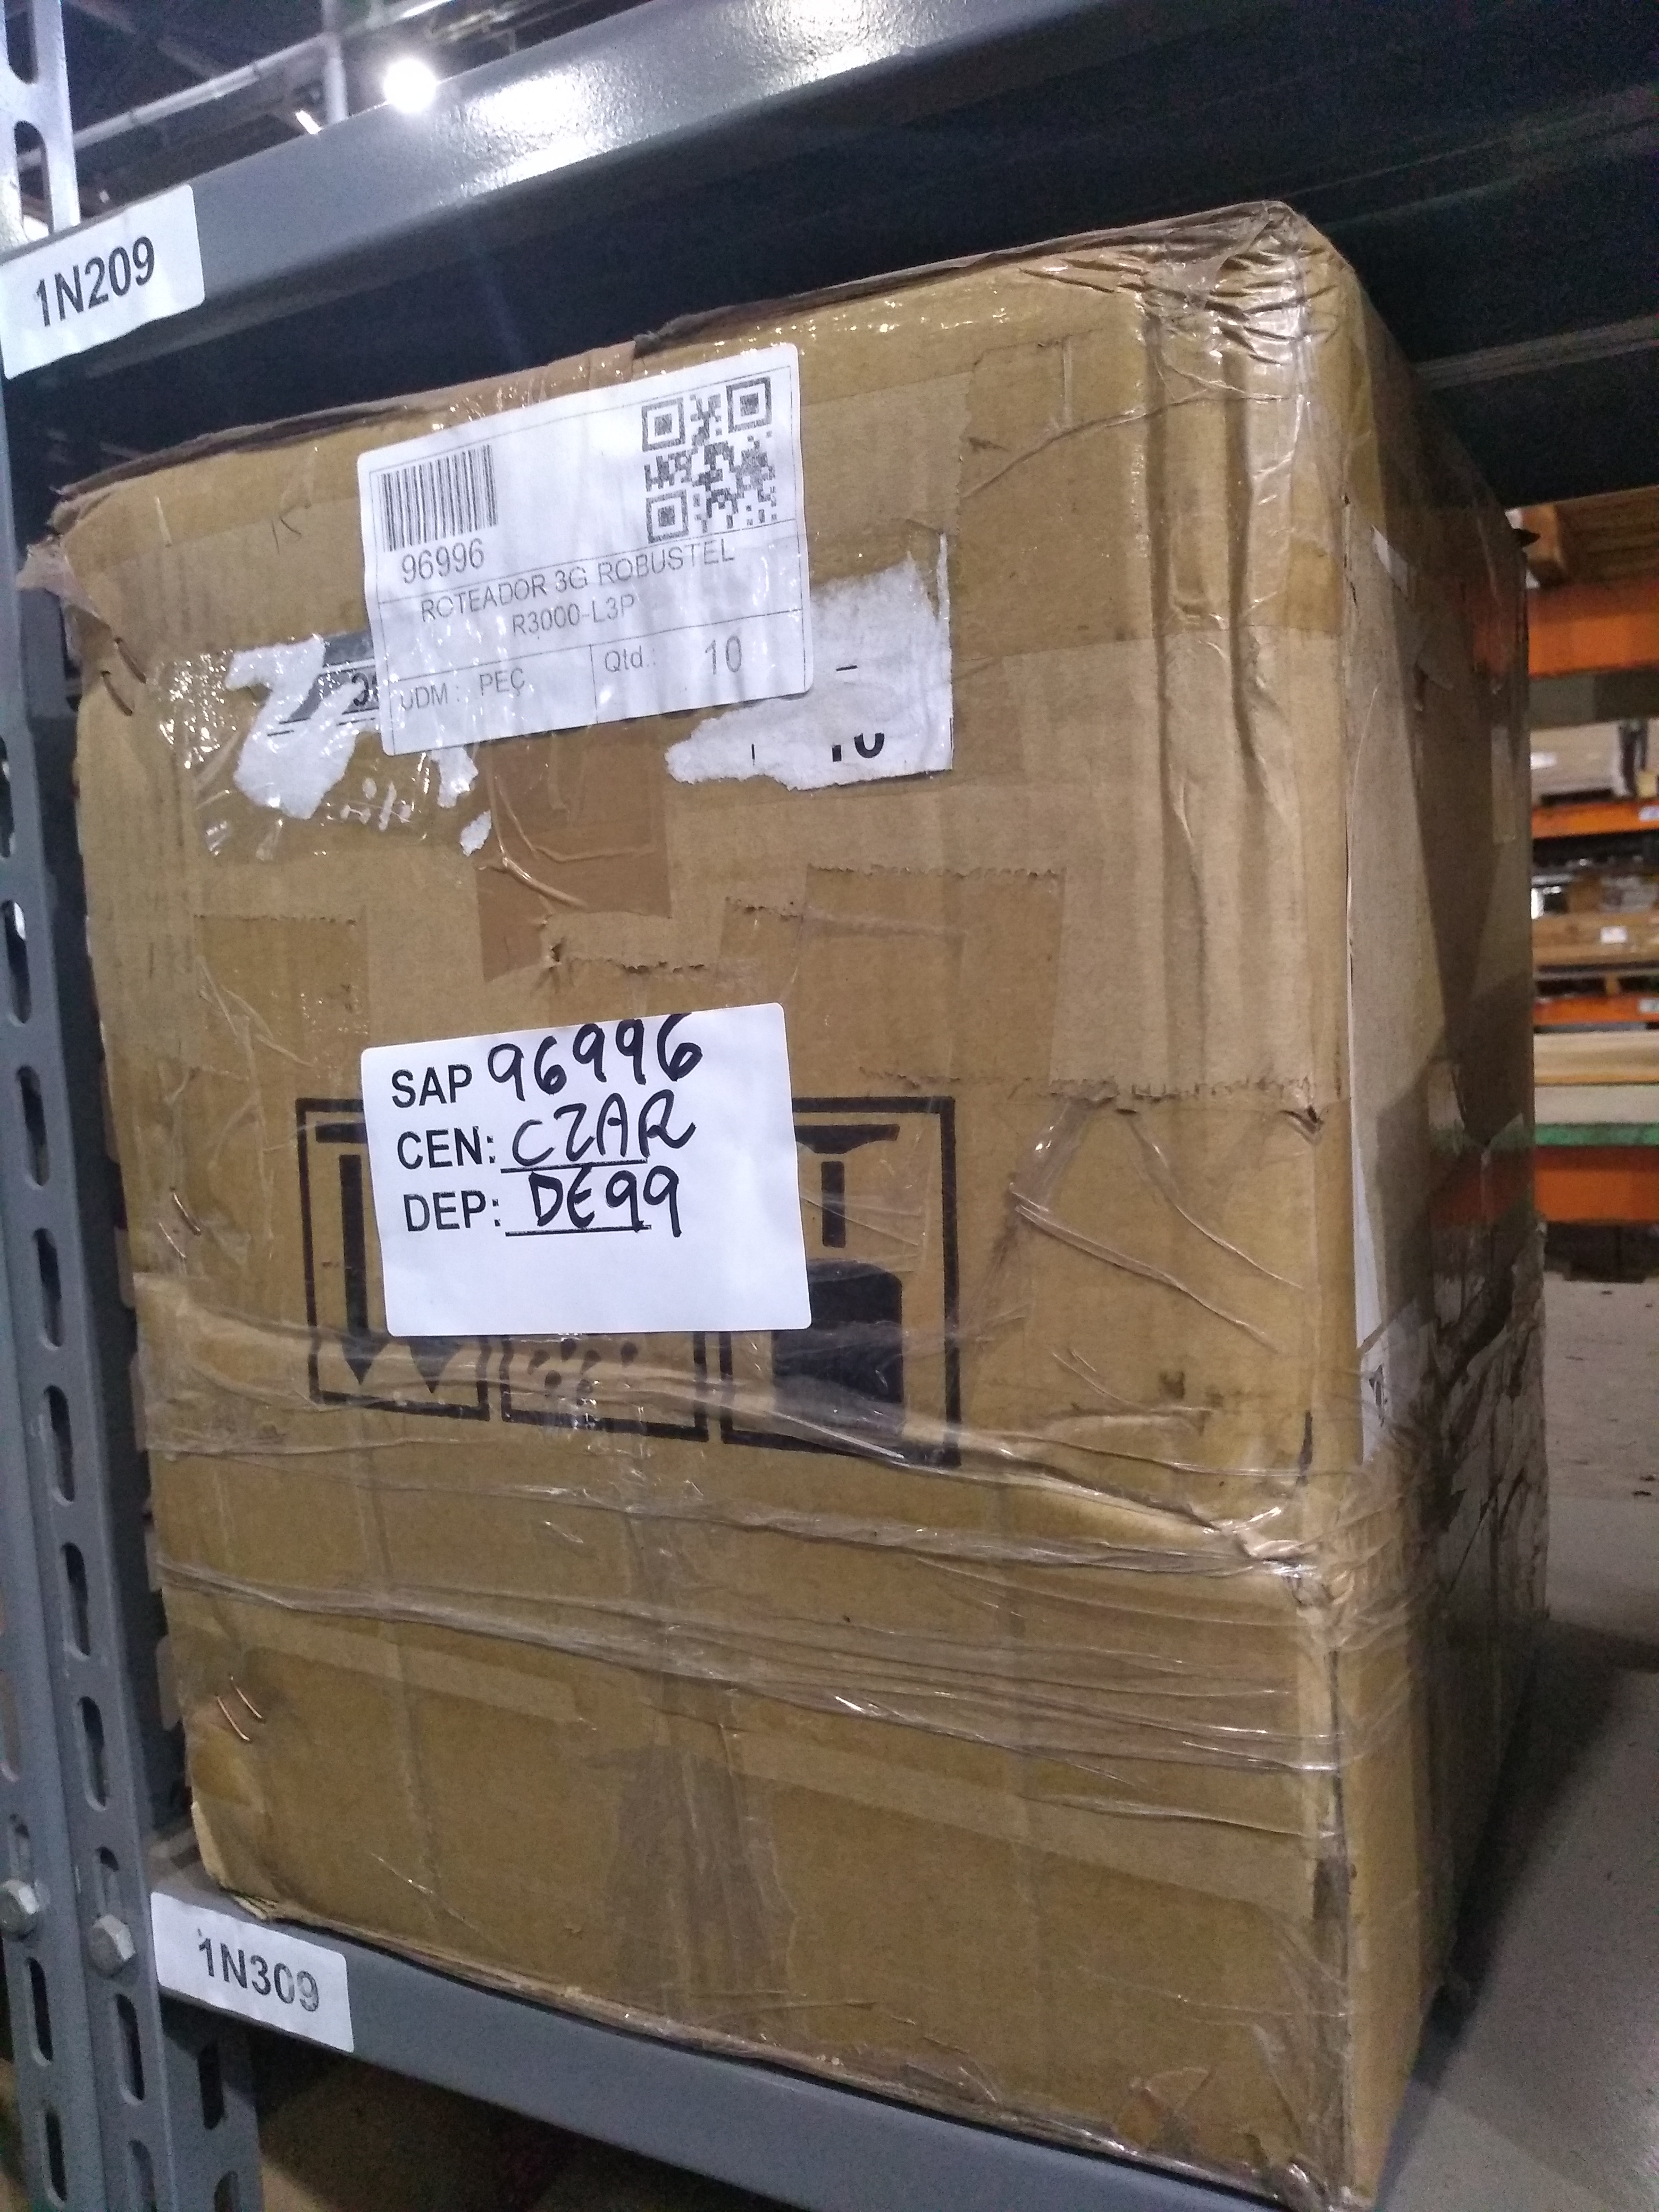 Roteador 3g robustel r3000-l3p aprox. 10 unidades